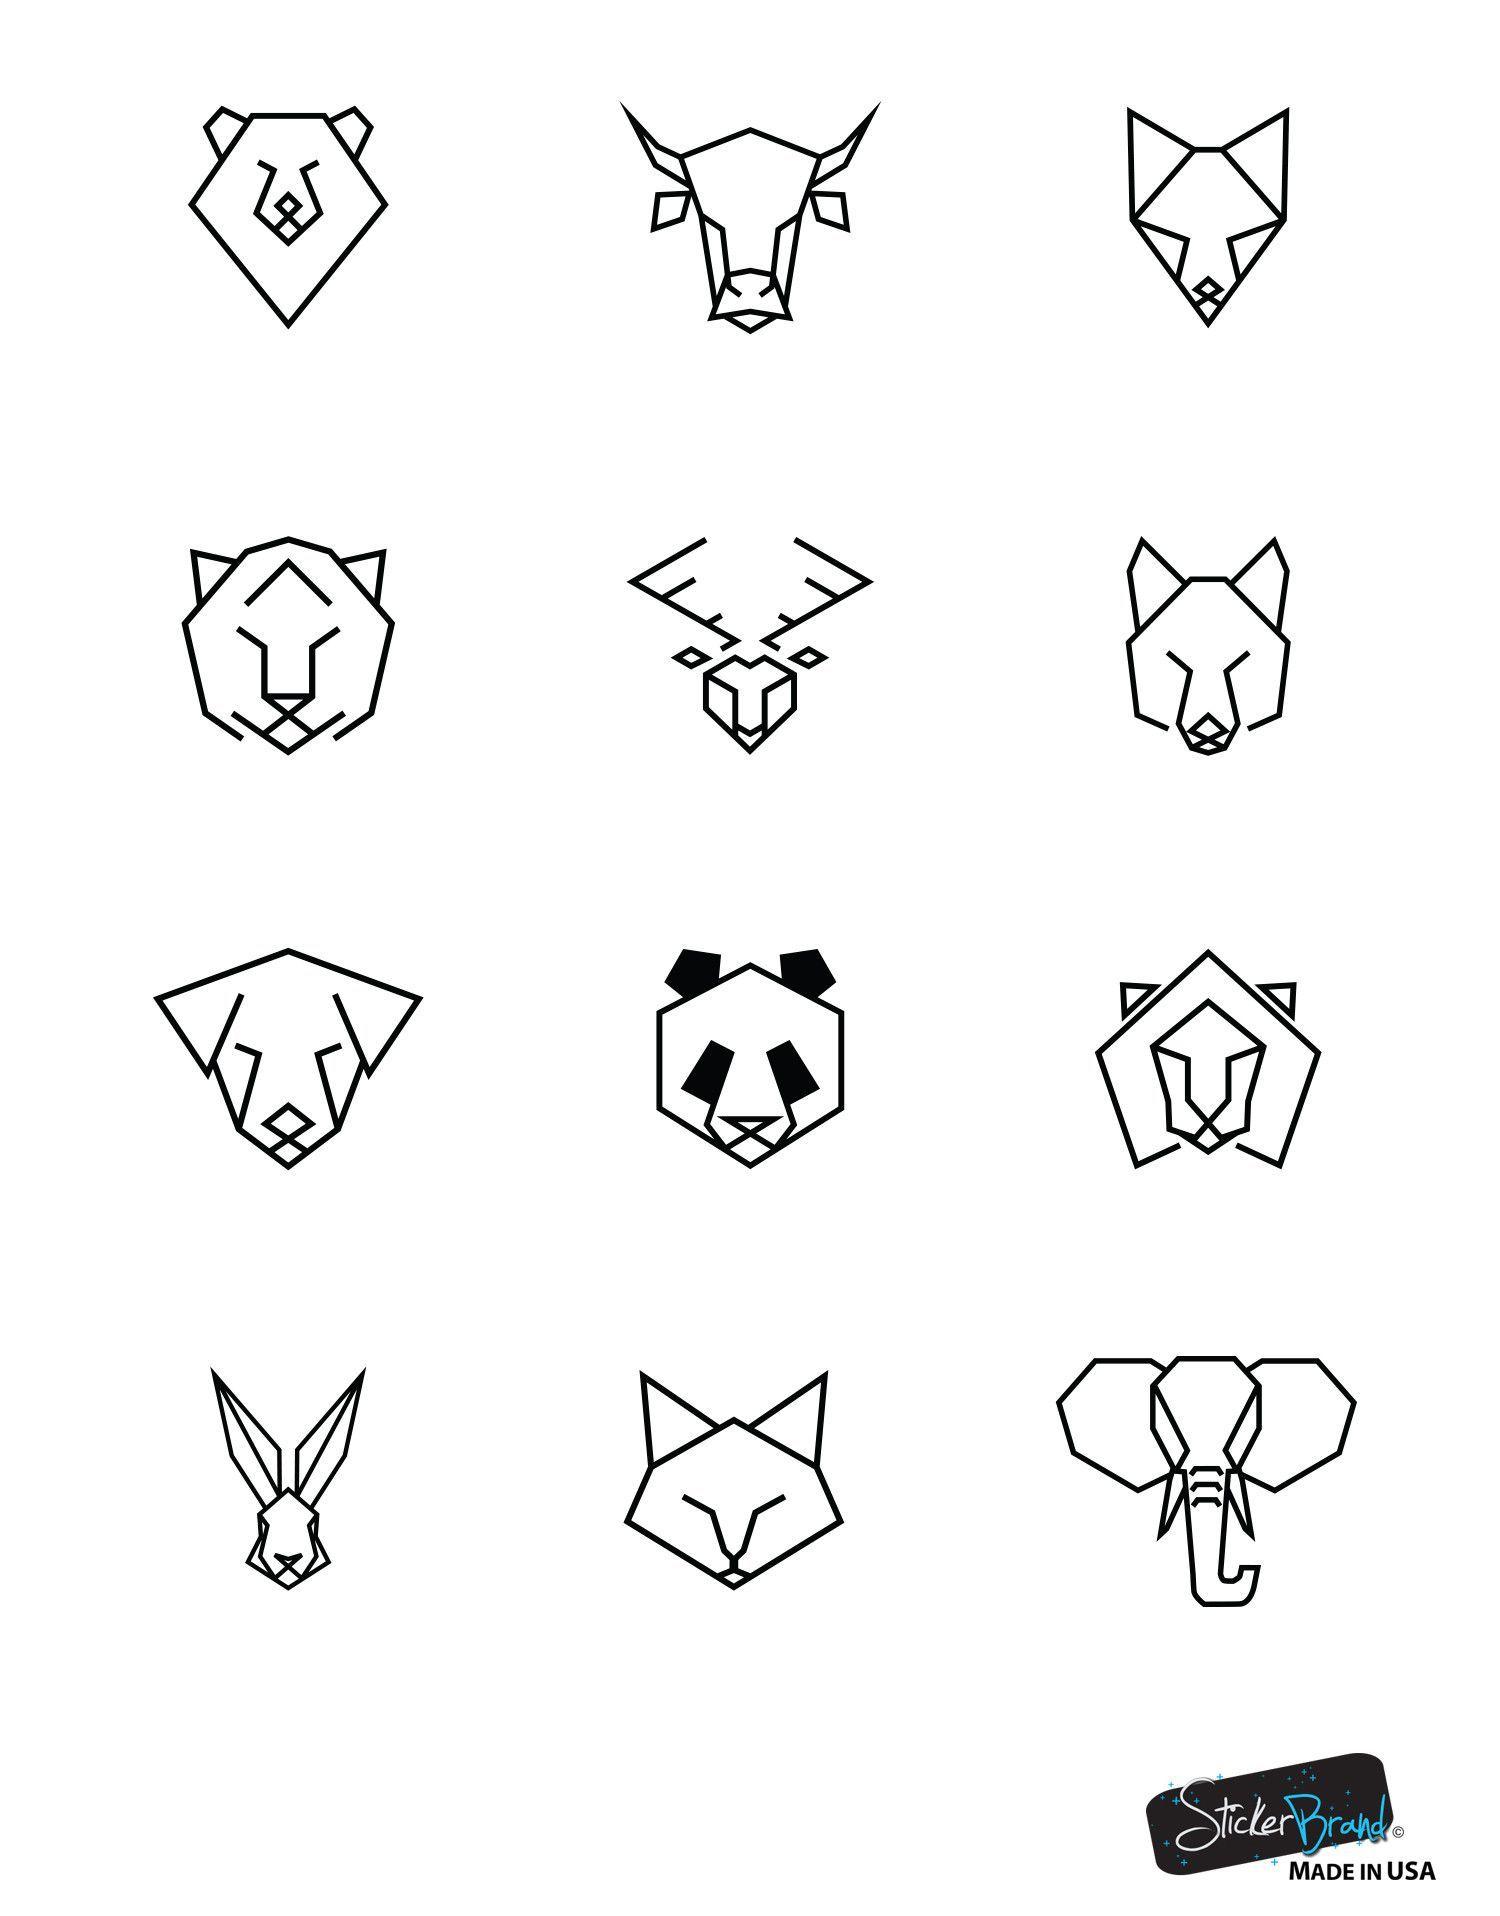 Bear, Bull, Fox, Tiger, Deer, Wolf, Dog, Panda, Lion